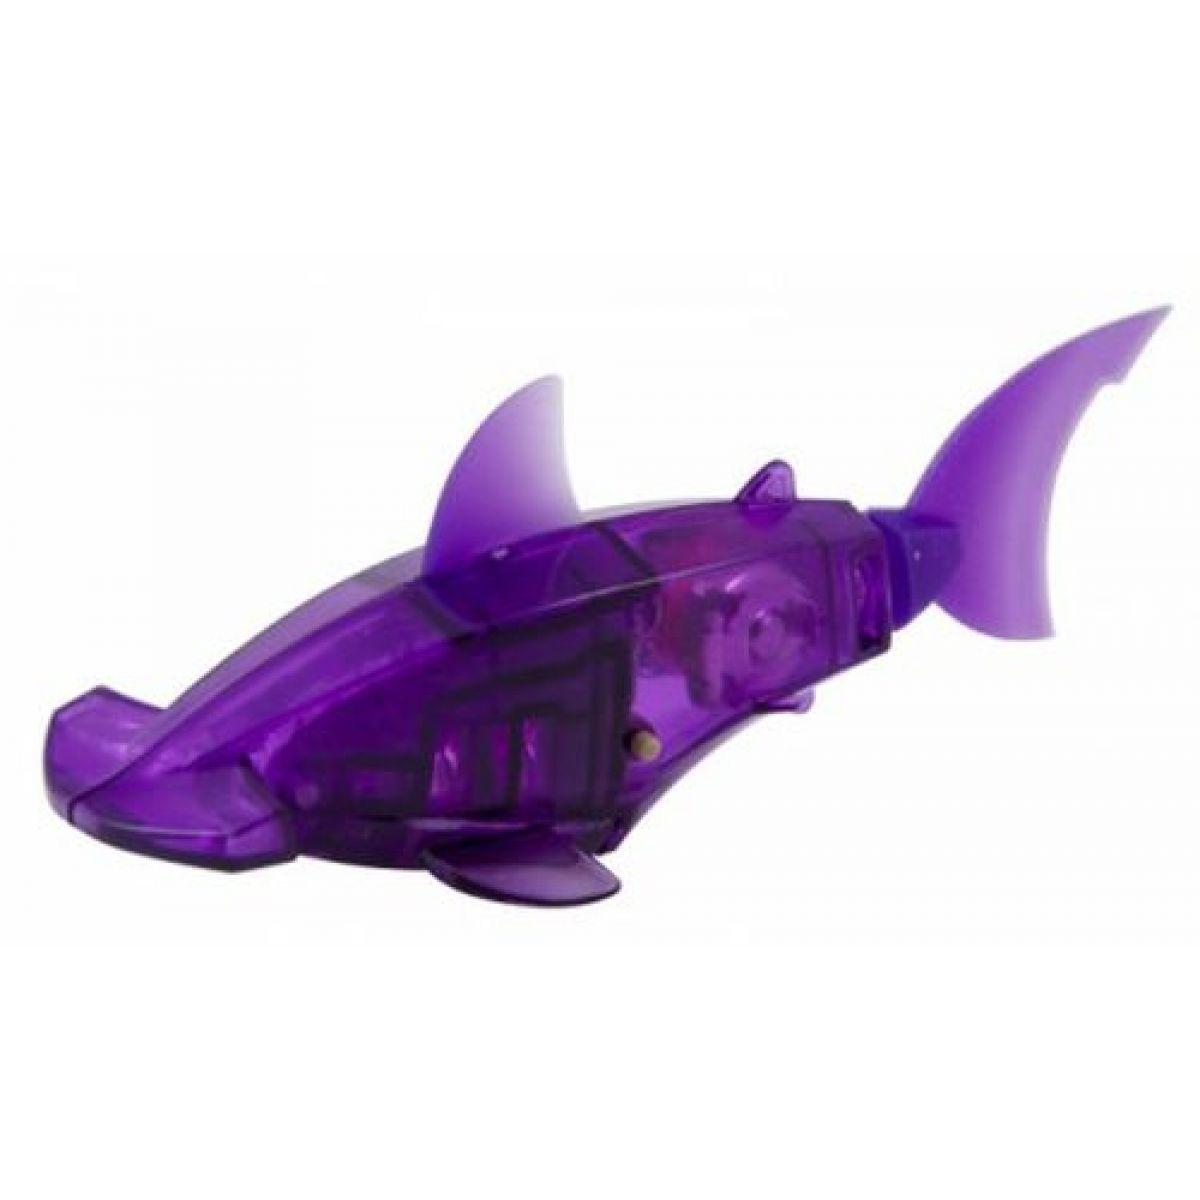 Hexbug Aquabot Led - Kladivoun fialový